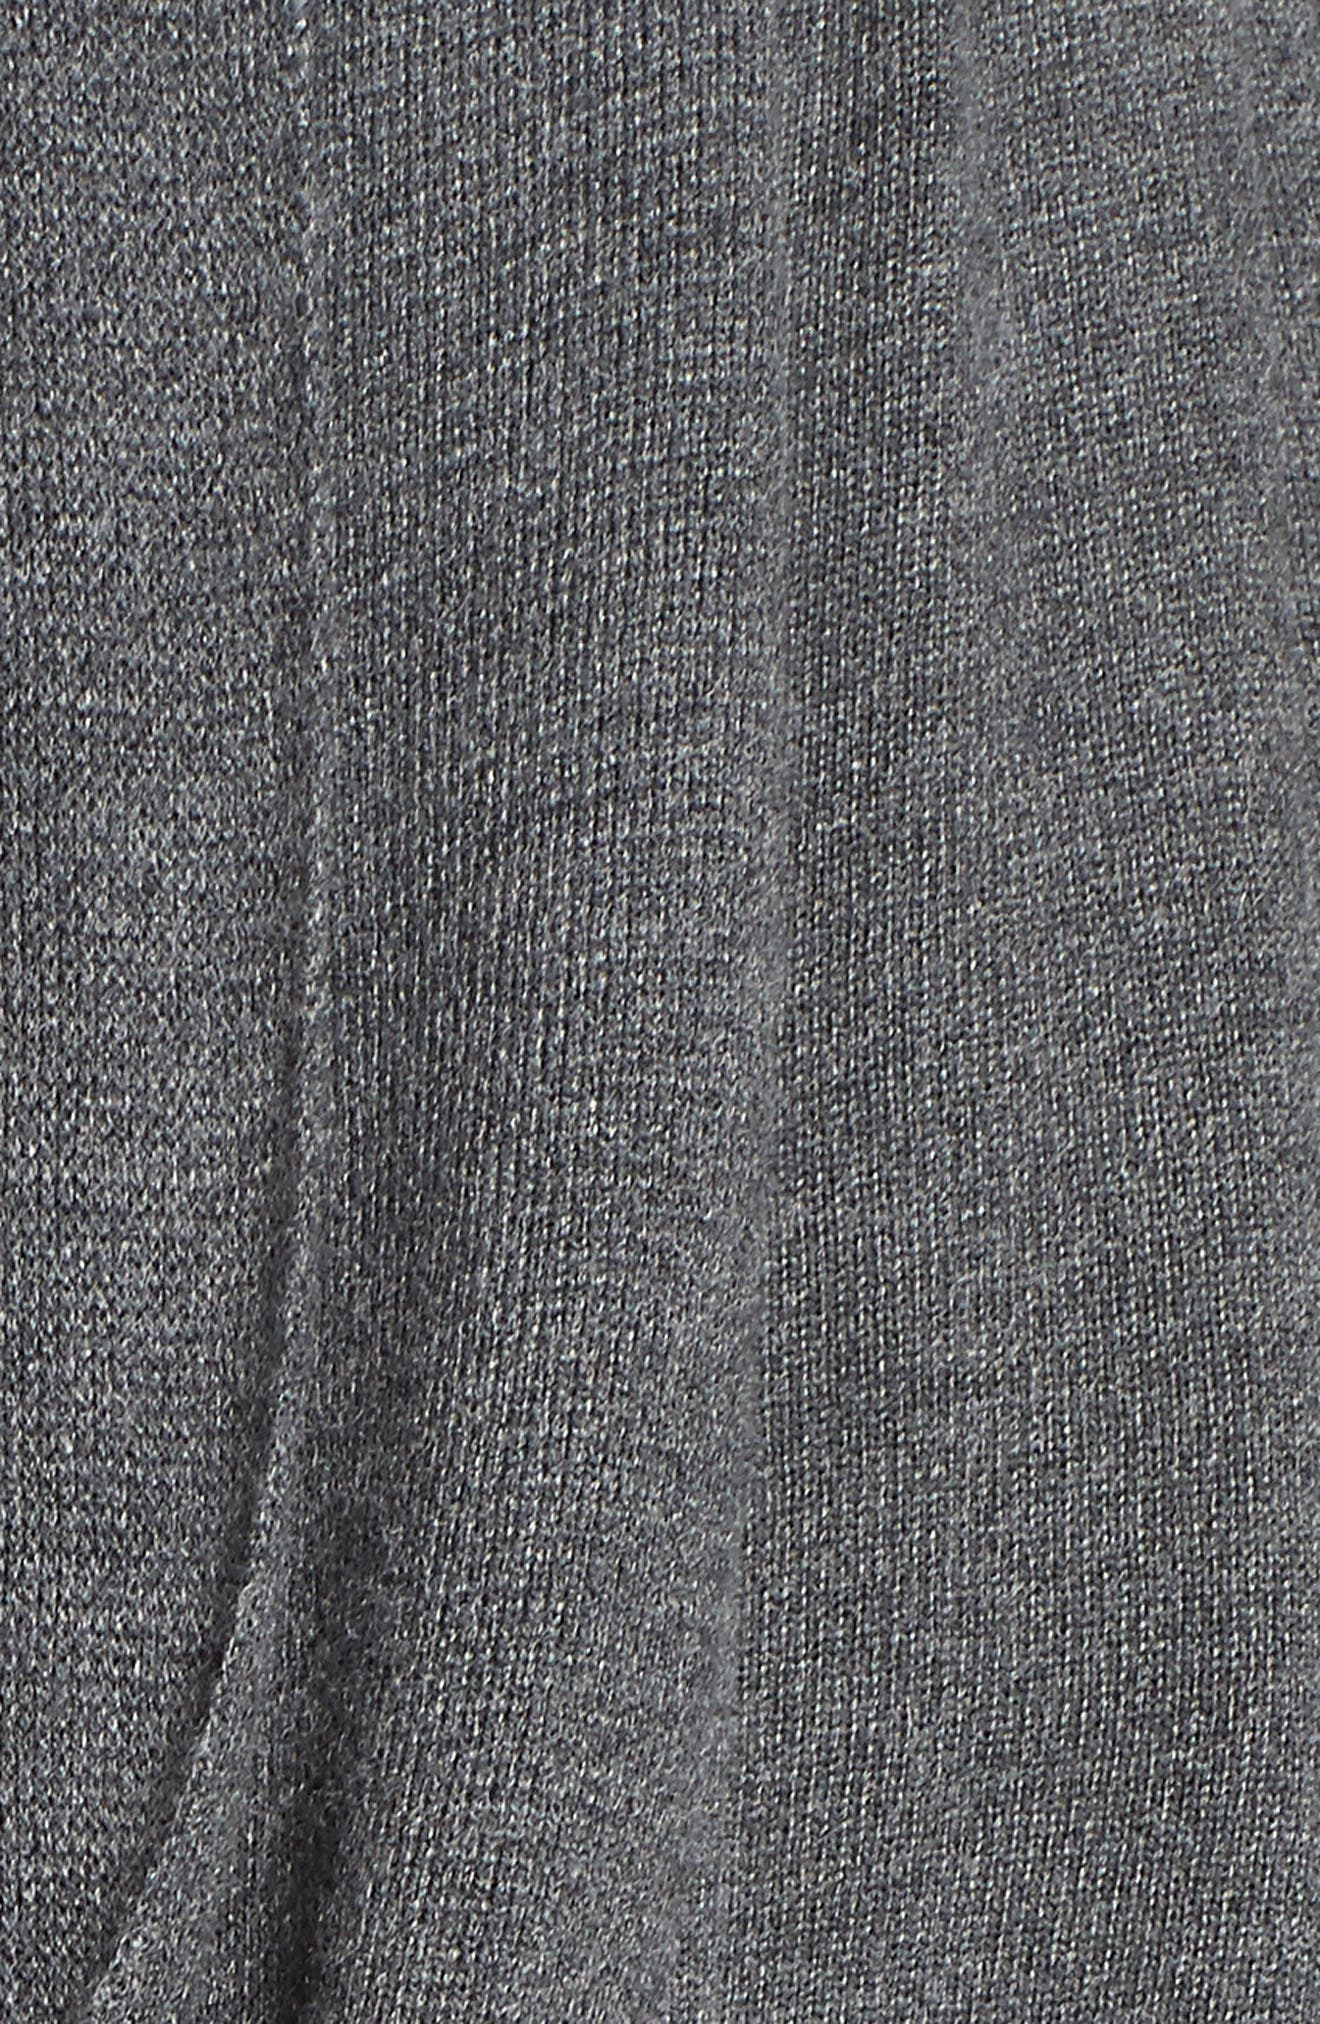 LongWrap Cardigan,                             Alternate thumbnail 5, color,                             DARK STEEL HEATHER